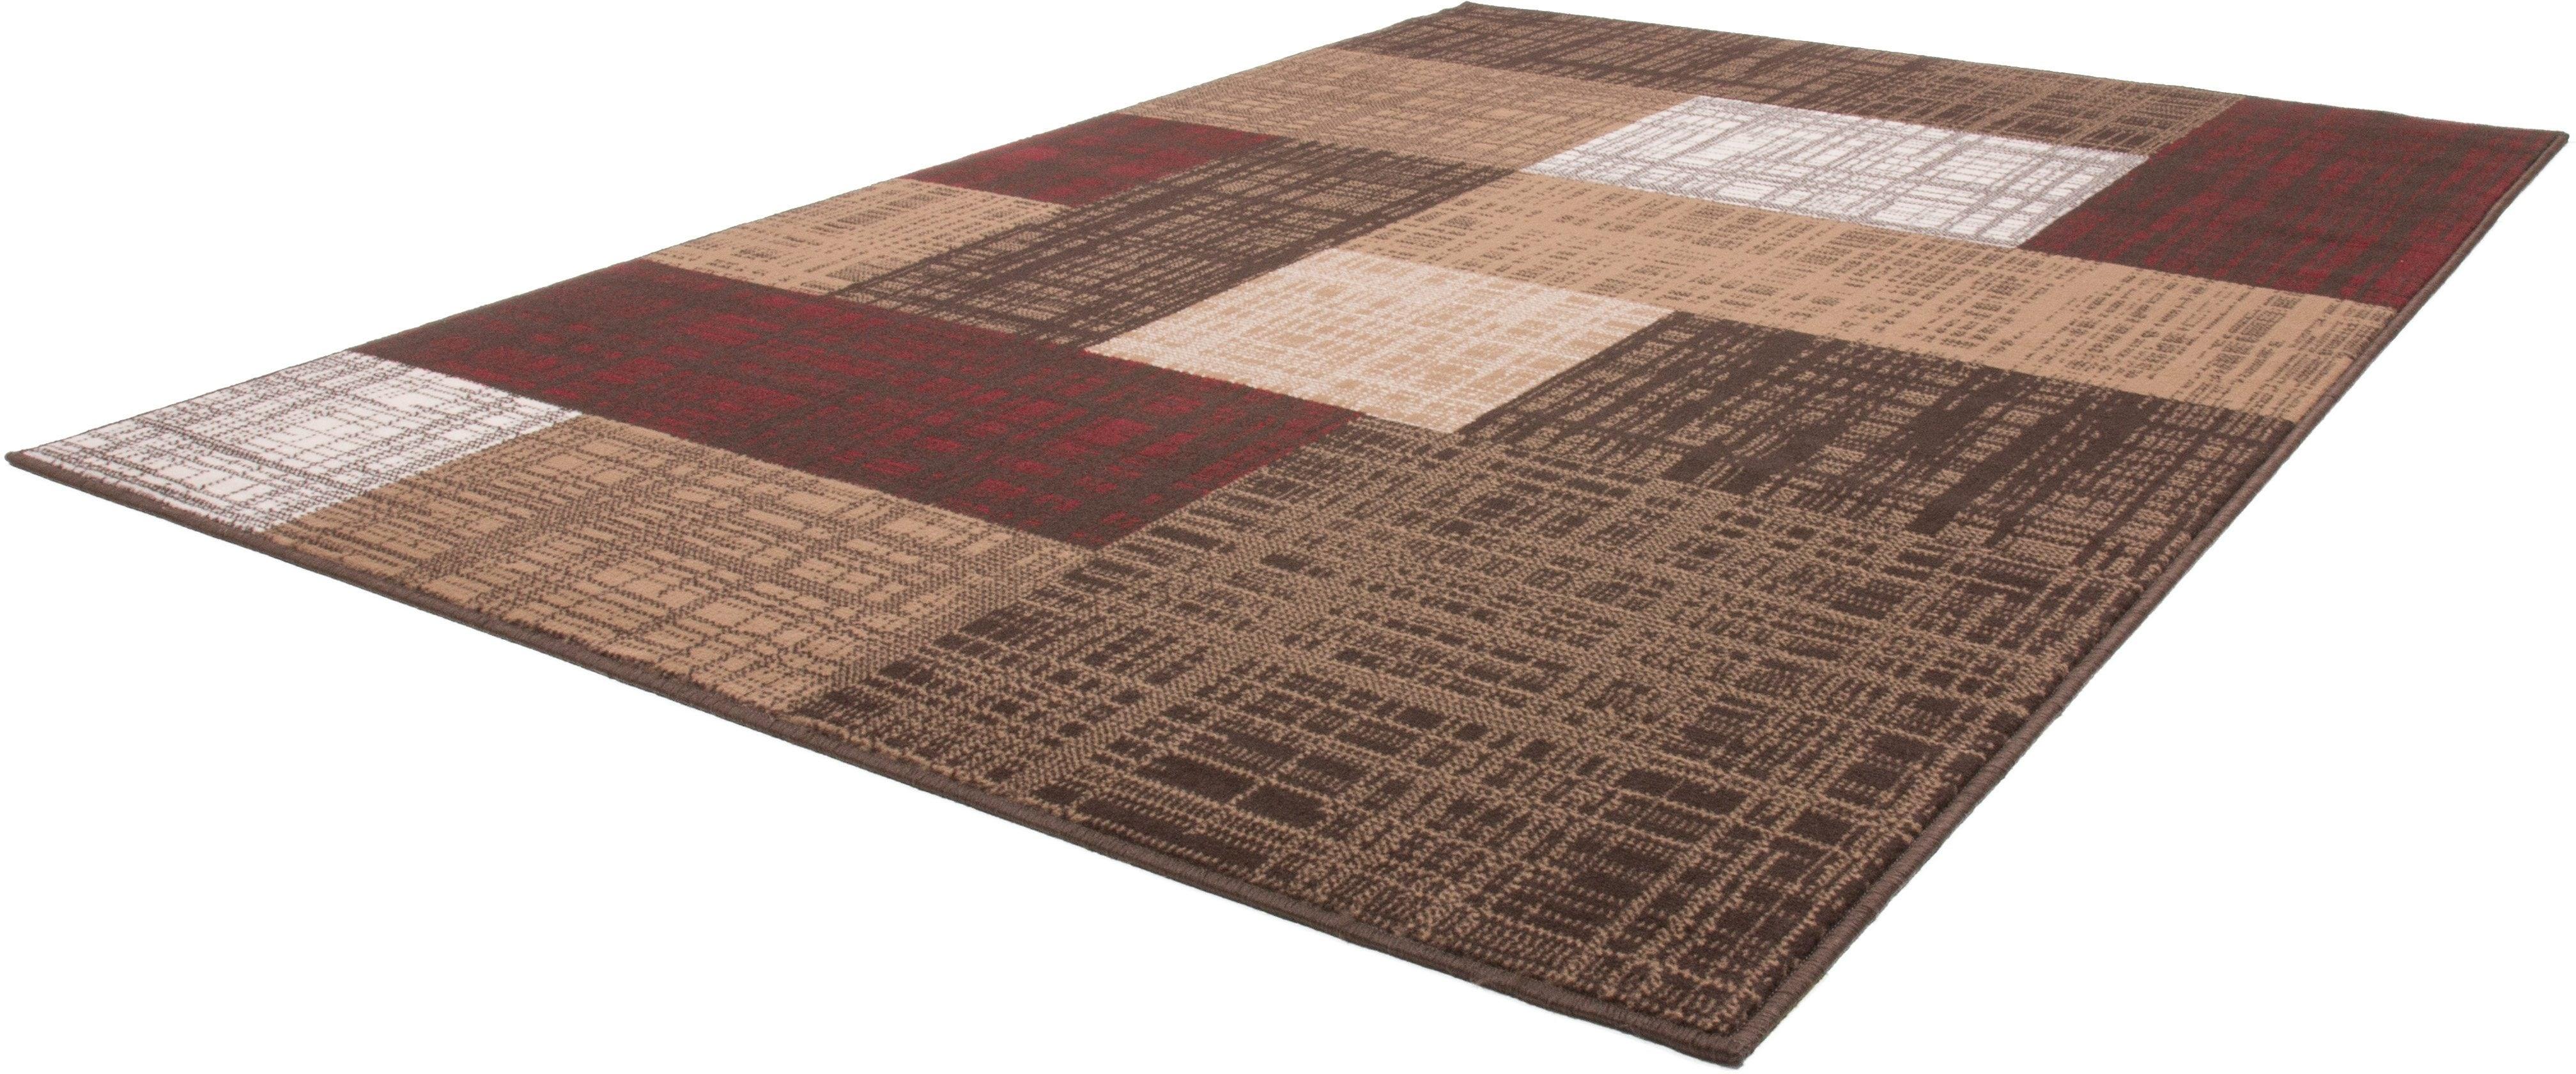 Teppich FUNKY 1953 Kayoom rechteckig Höhe 7 mm maschinell gewebt